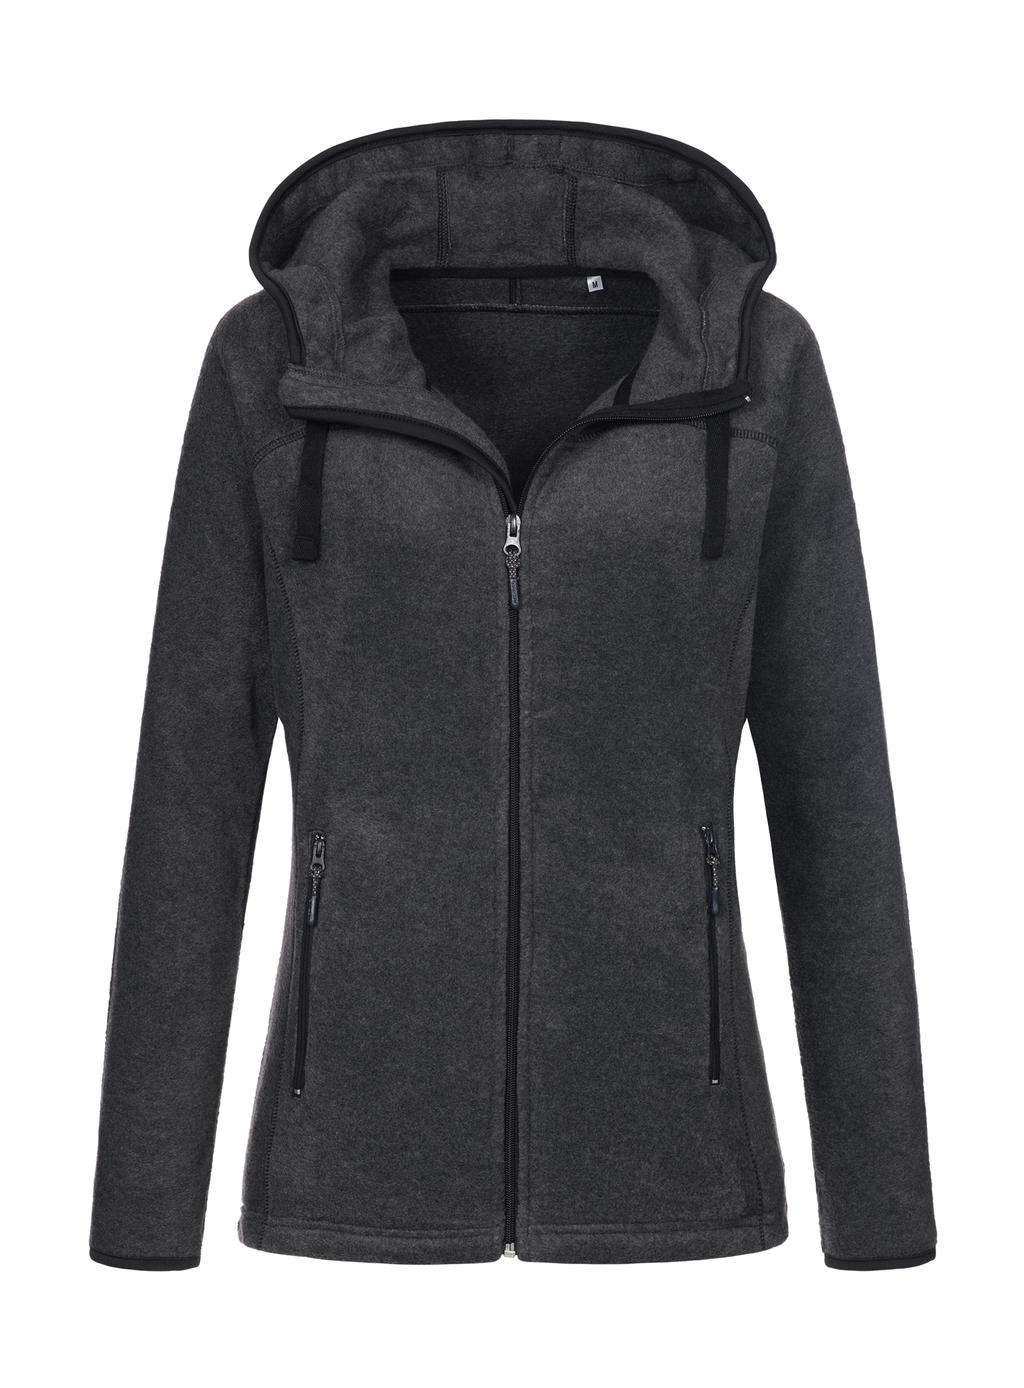 Dámská power fleece bunda - zvìtšit obrázek